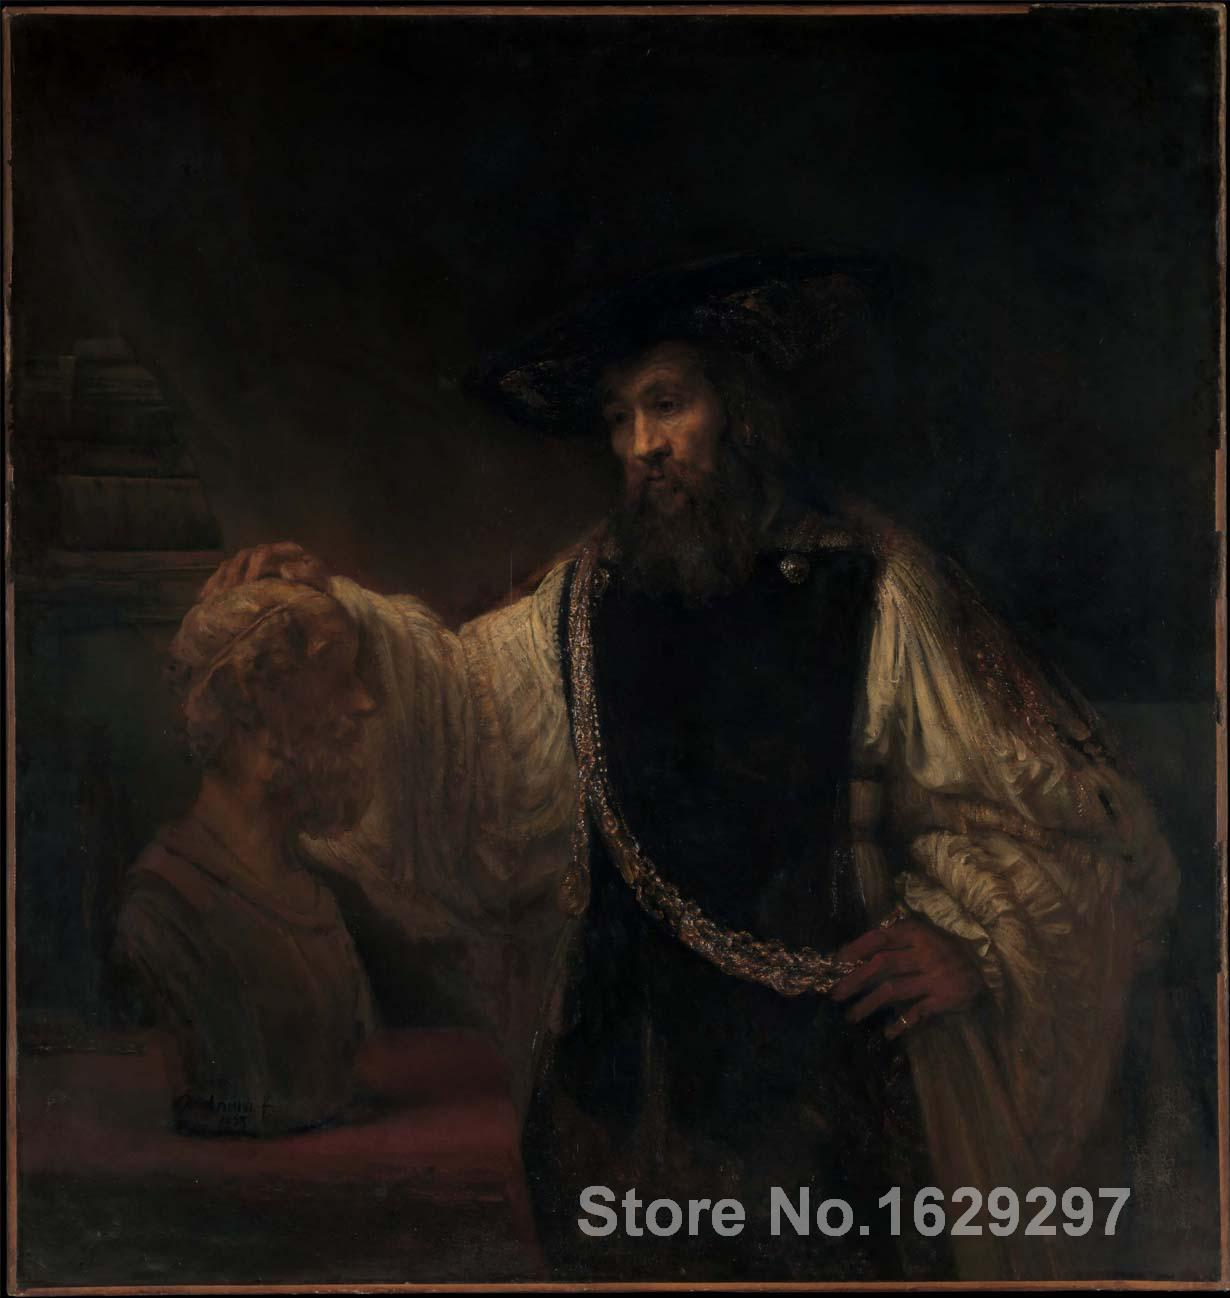 Pinturas de retrato Rembrandt van Rijns art reproduction Aristóteles con un busto de Homer pintado a mano de alta calidad